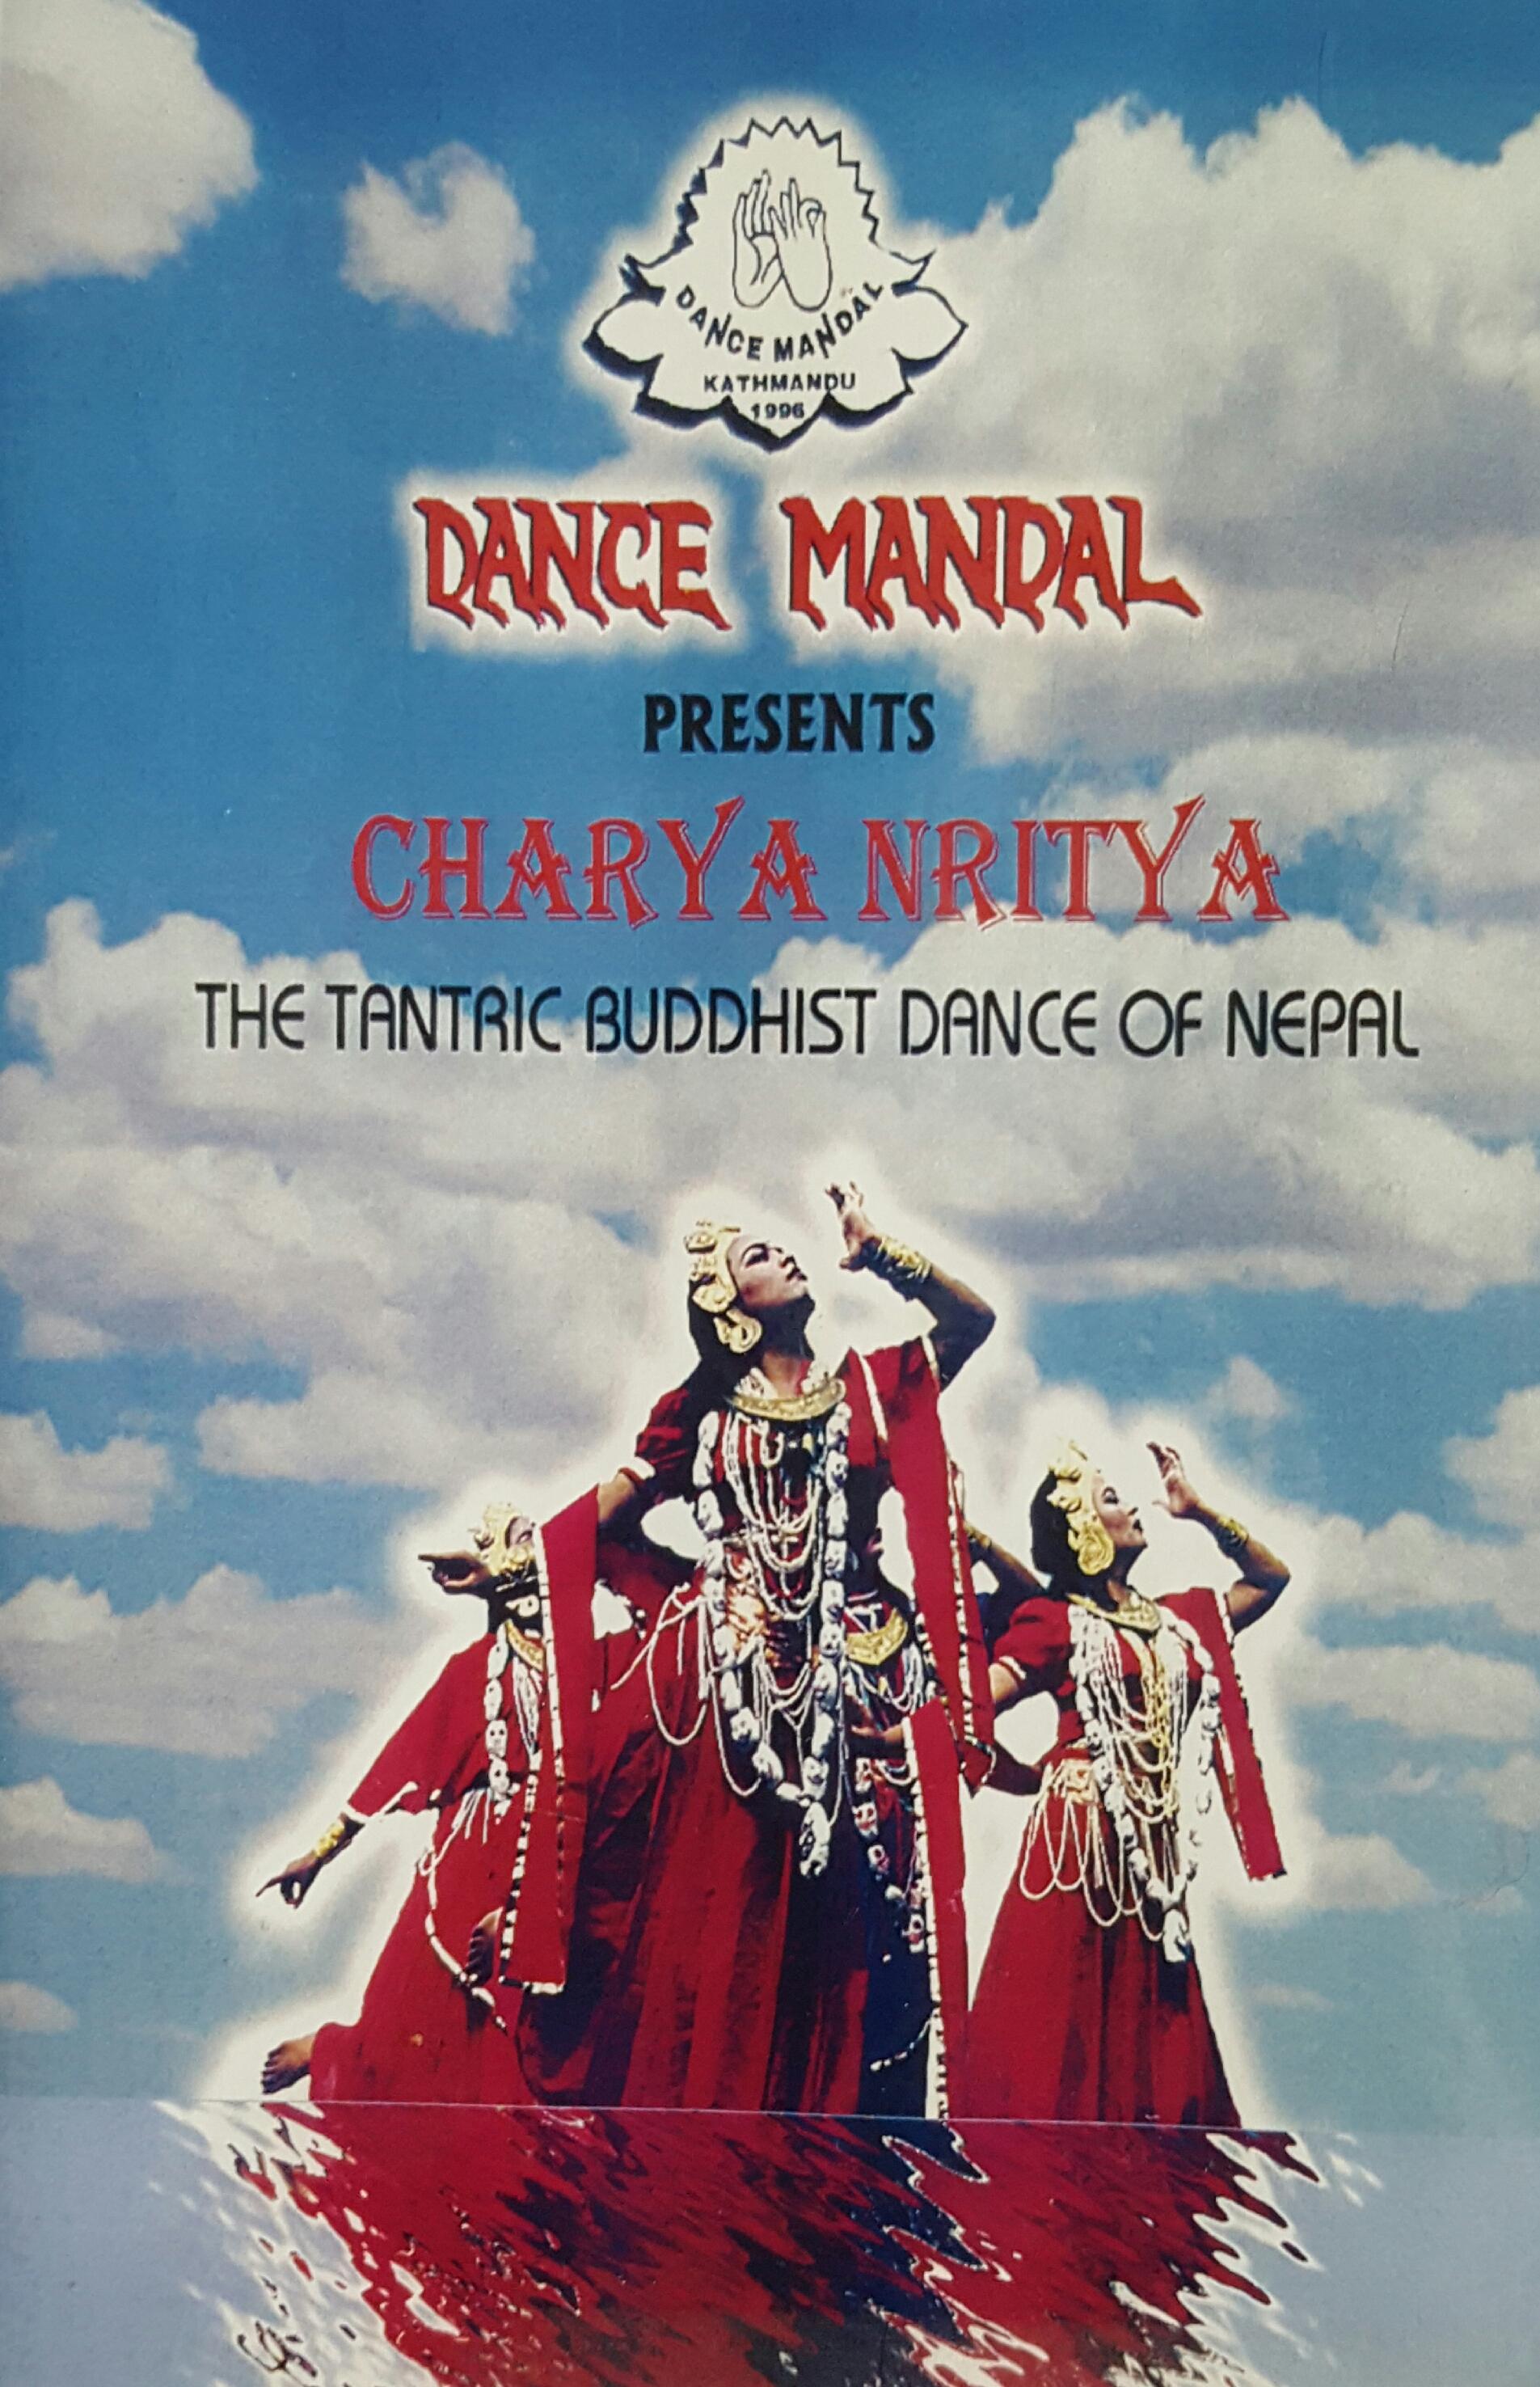 DVDs, CDs, & Books | Dance Mandal